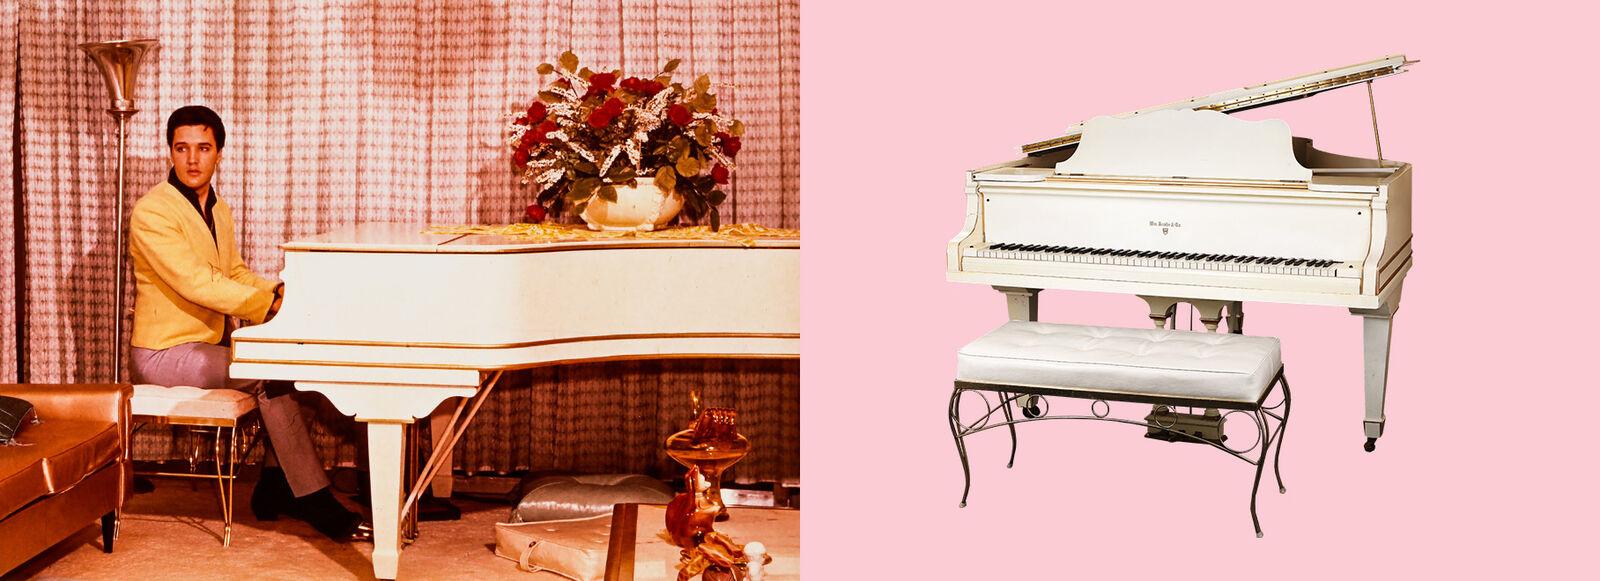 Bid on Elvis's piano to support the Starkey Foundation.